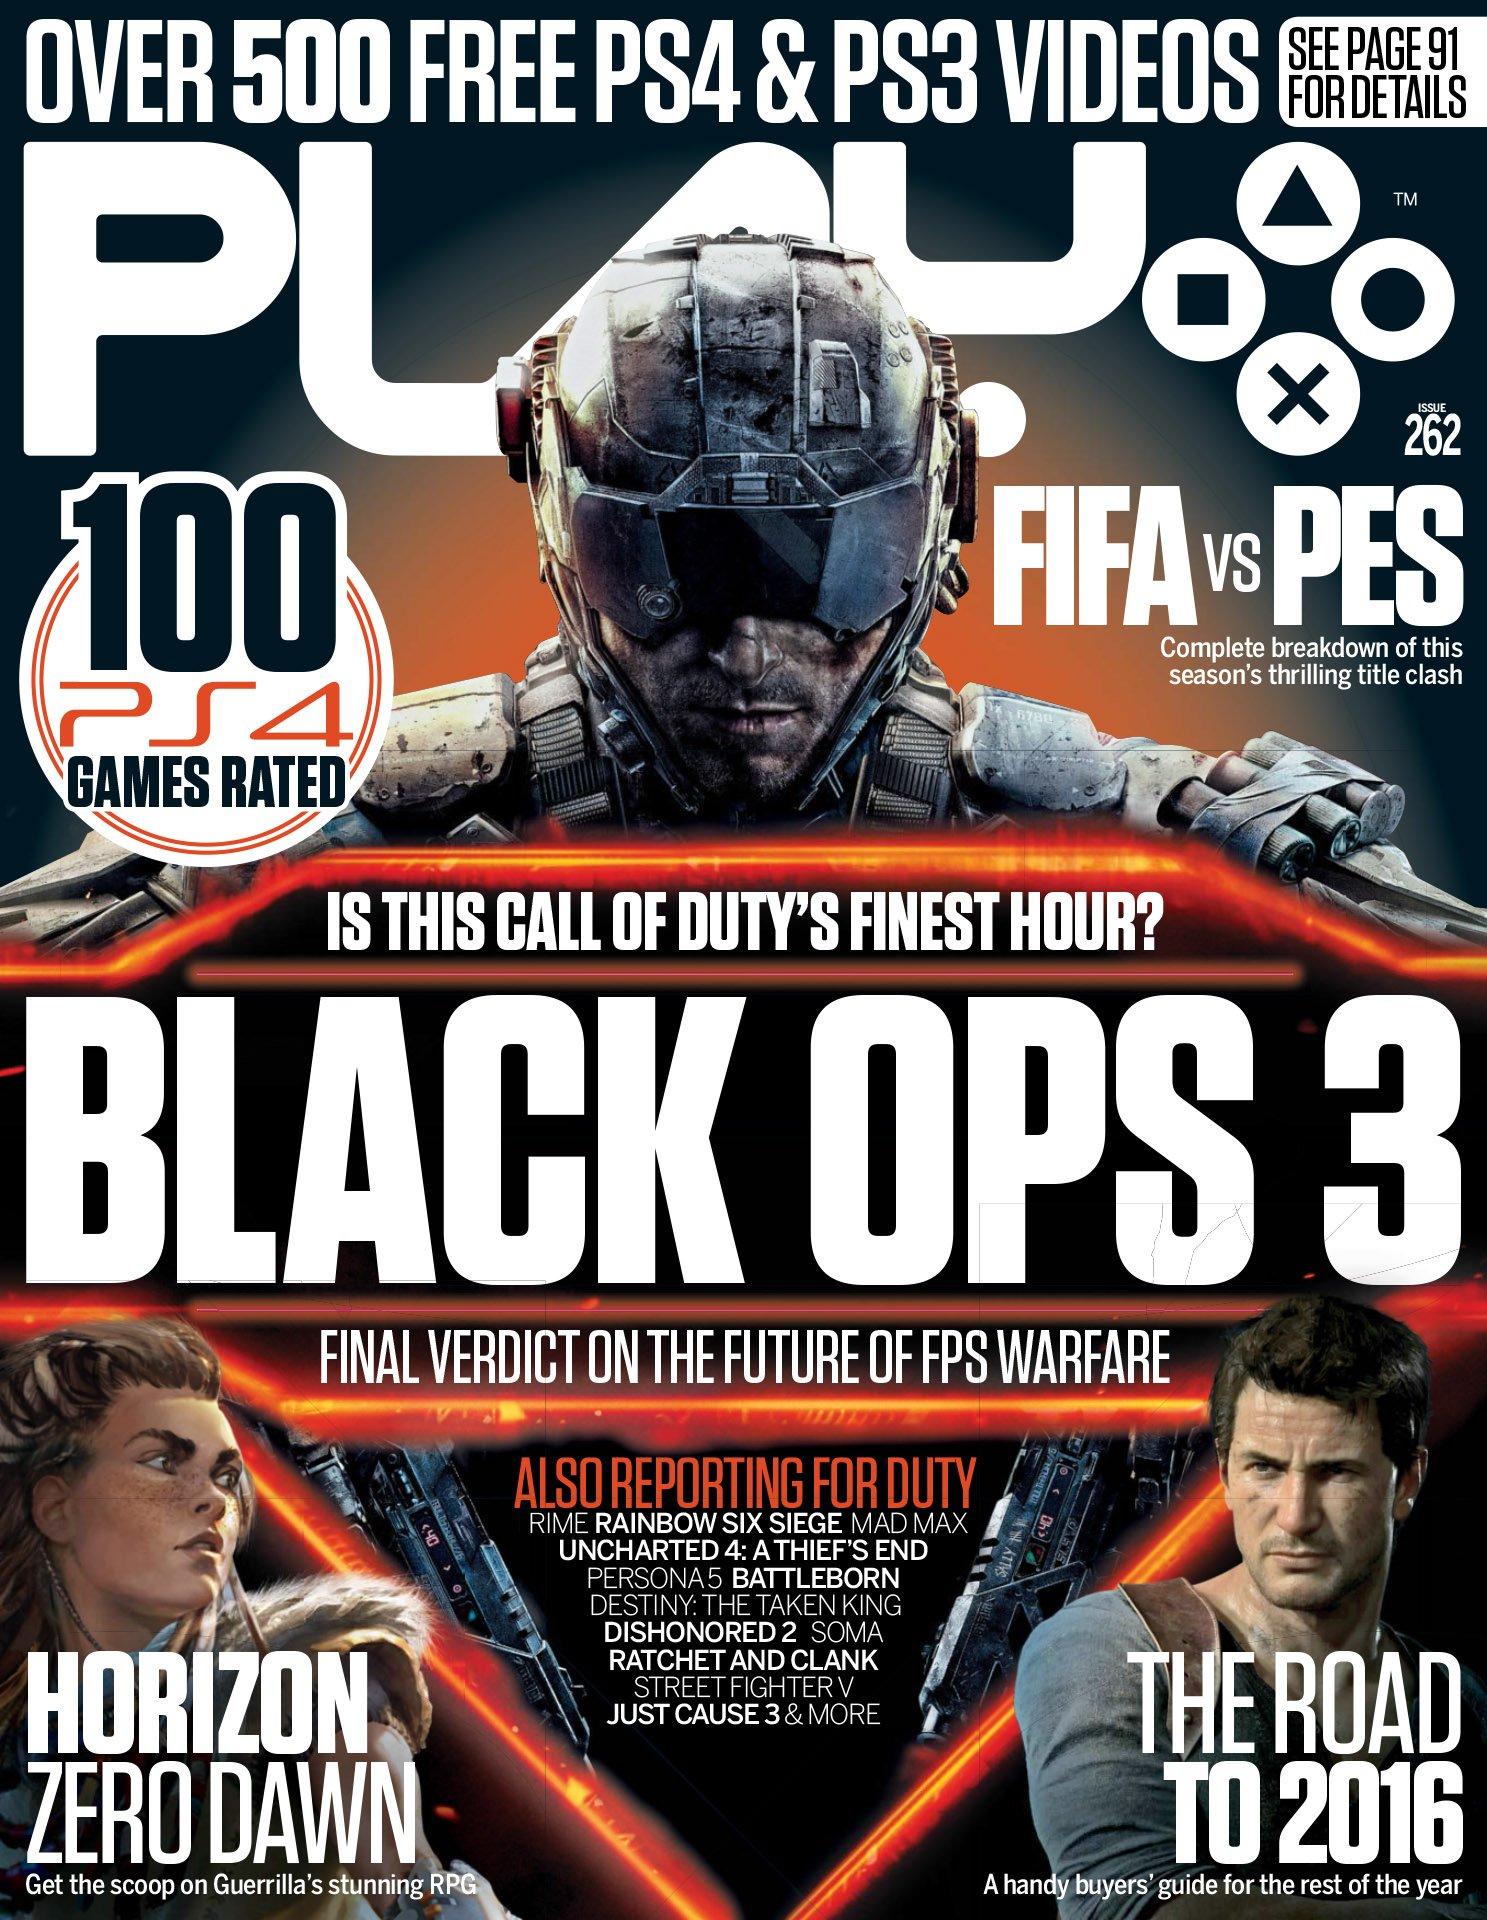 Play UK 262 (November 2015)